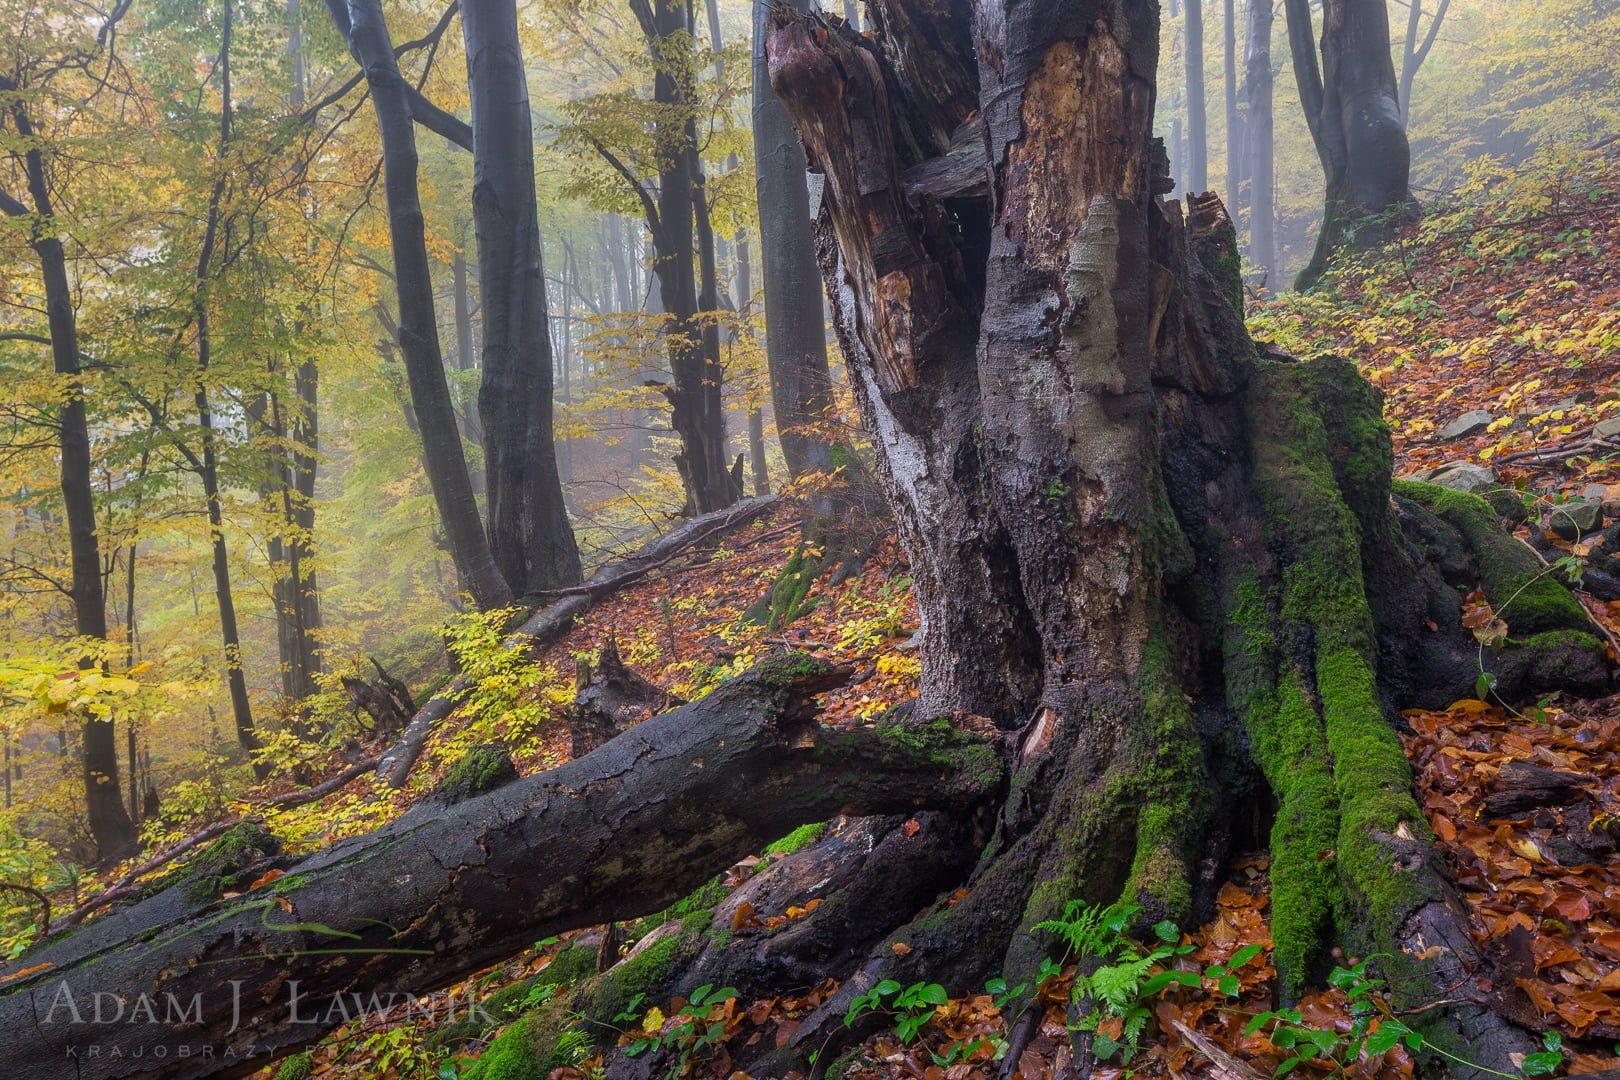 Magura National Park, Poland 1510-00940C